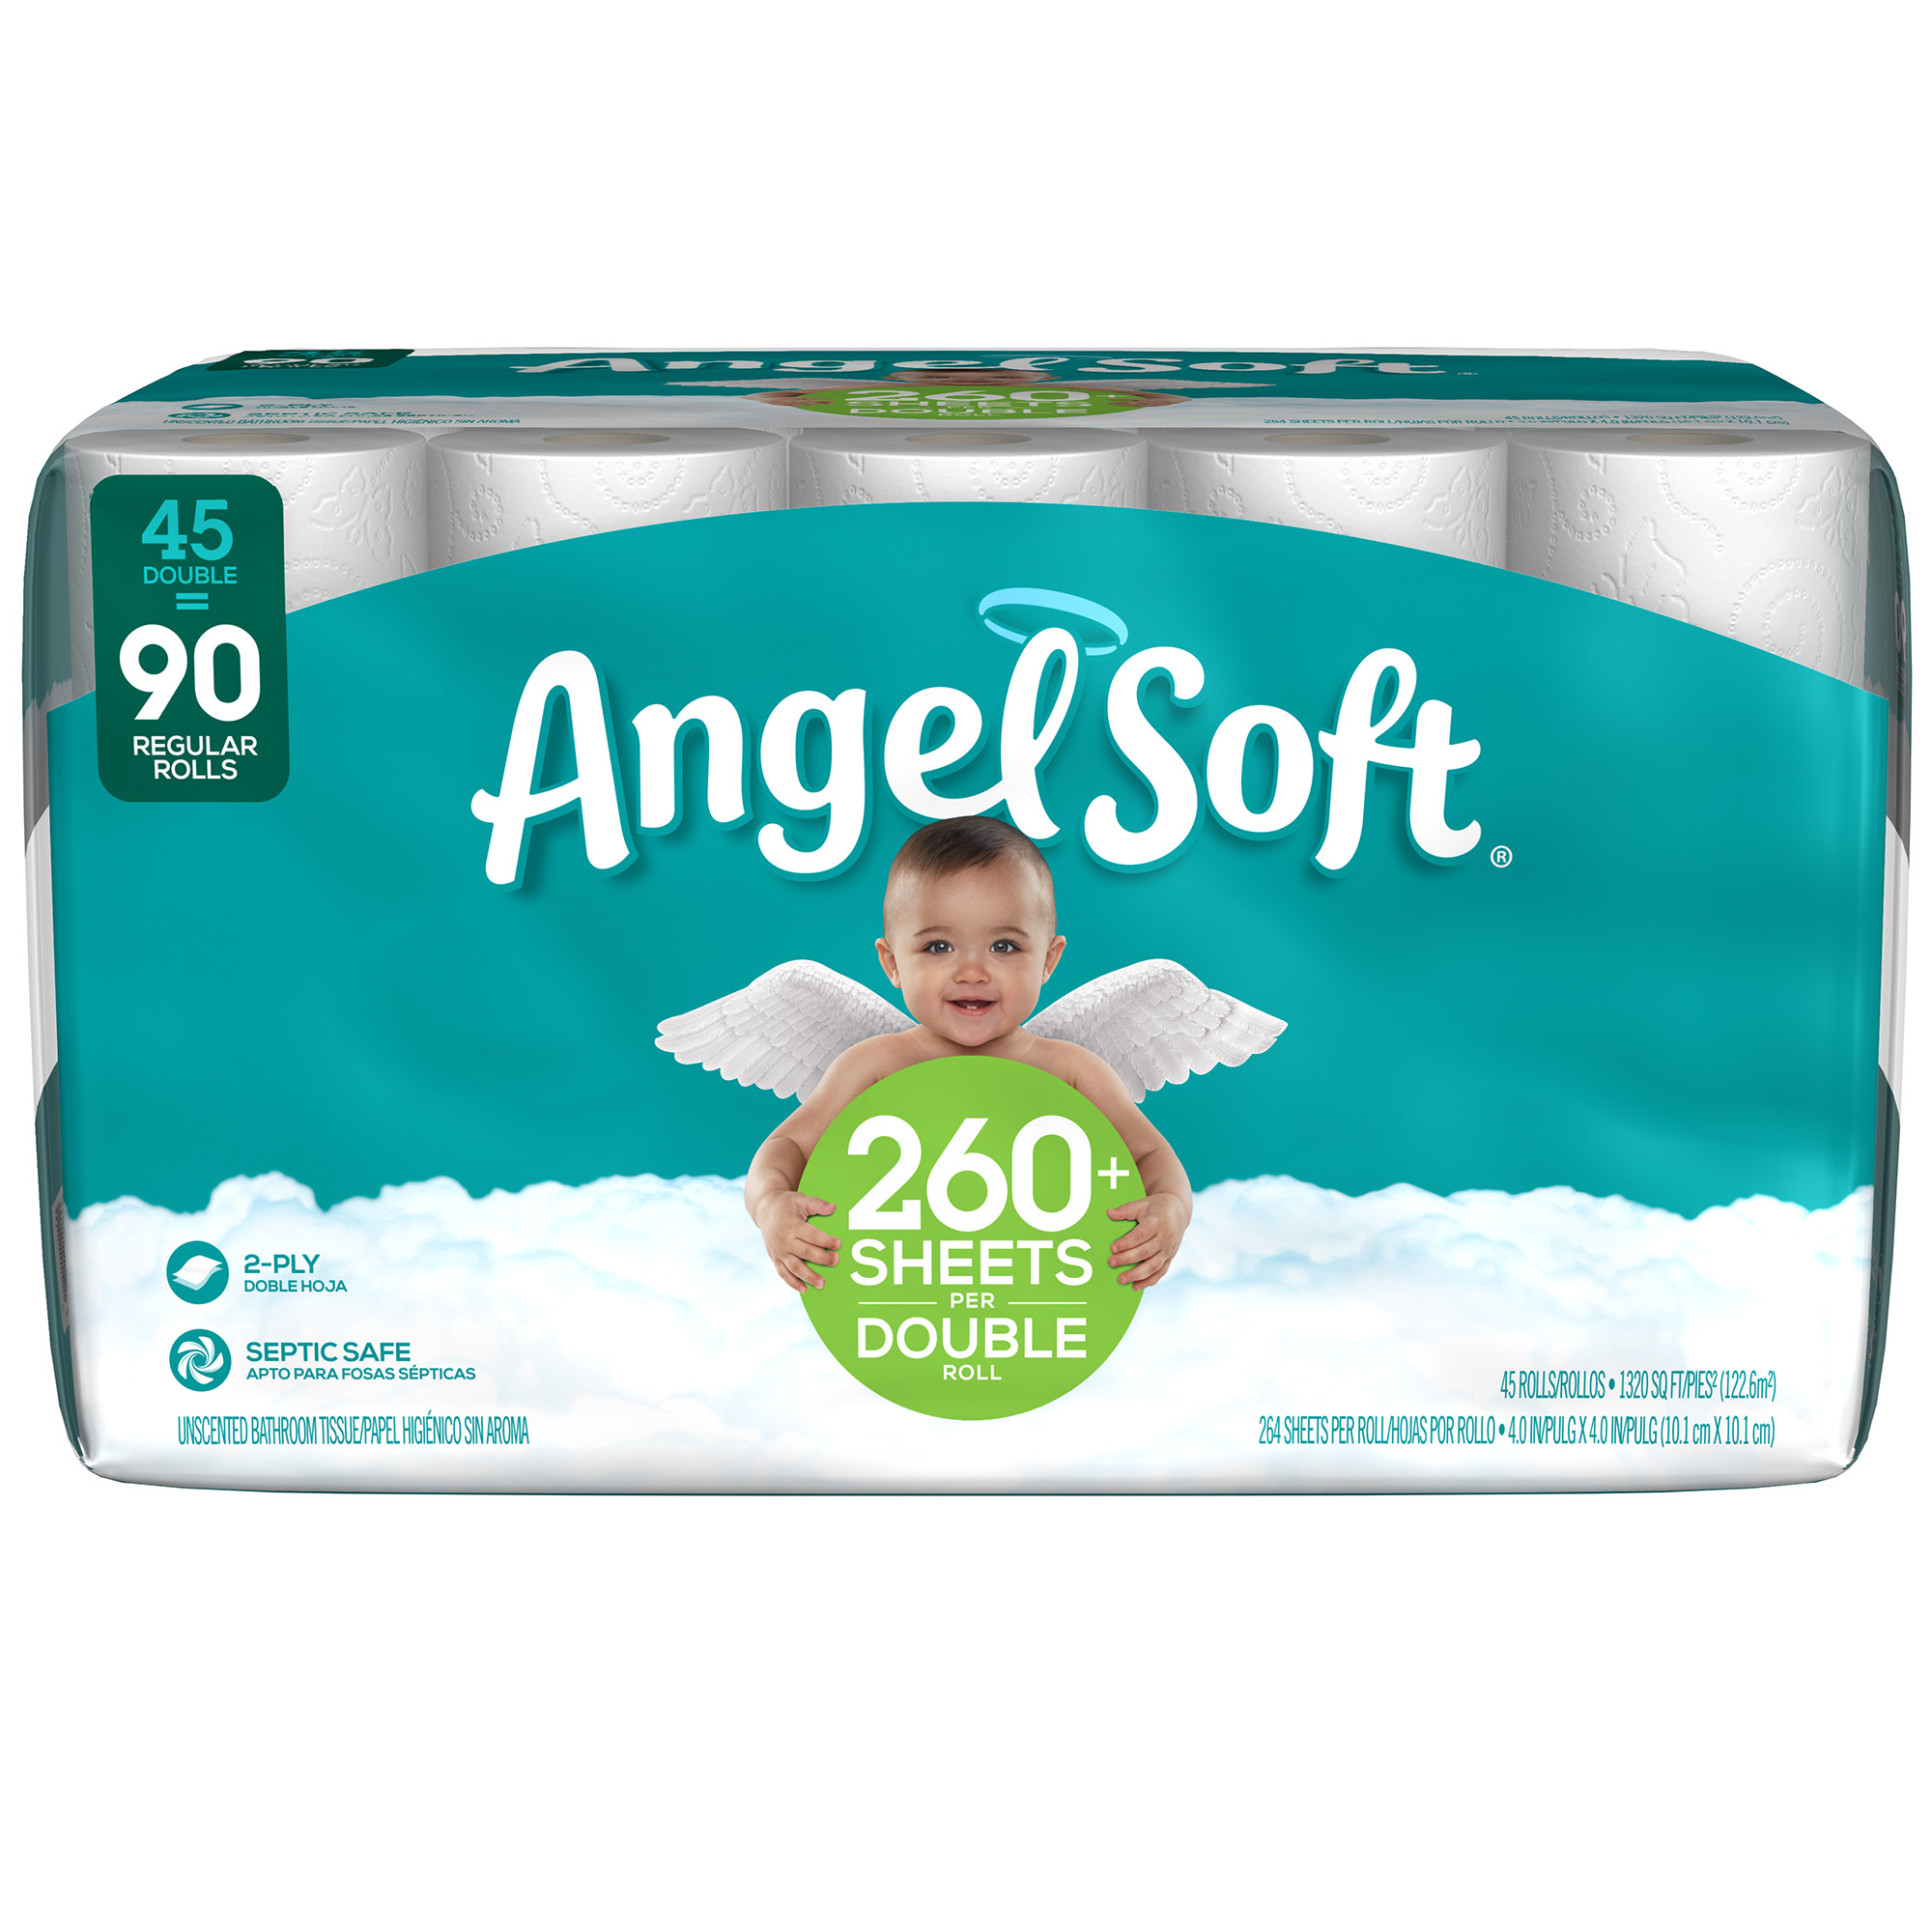 Angel Soft Toilet Paper, 45 Double Rolls